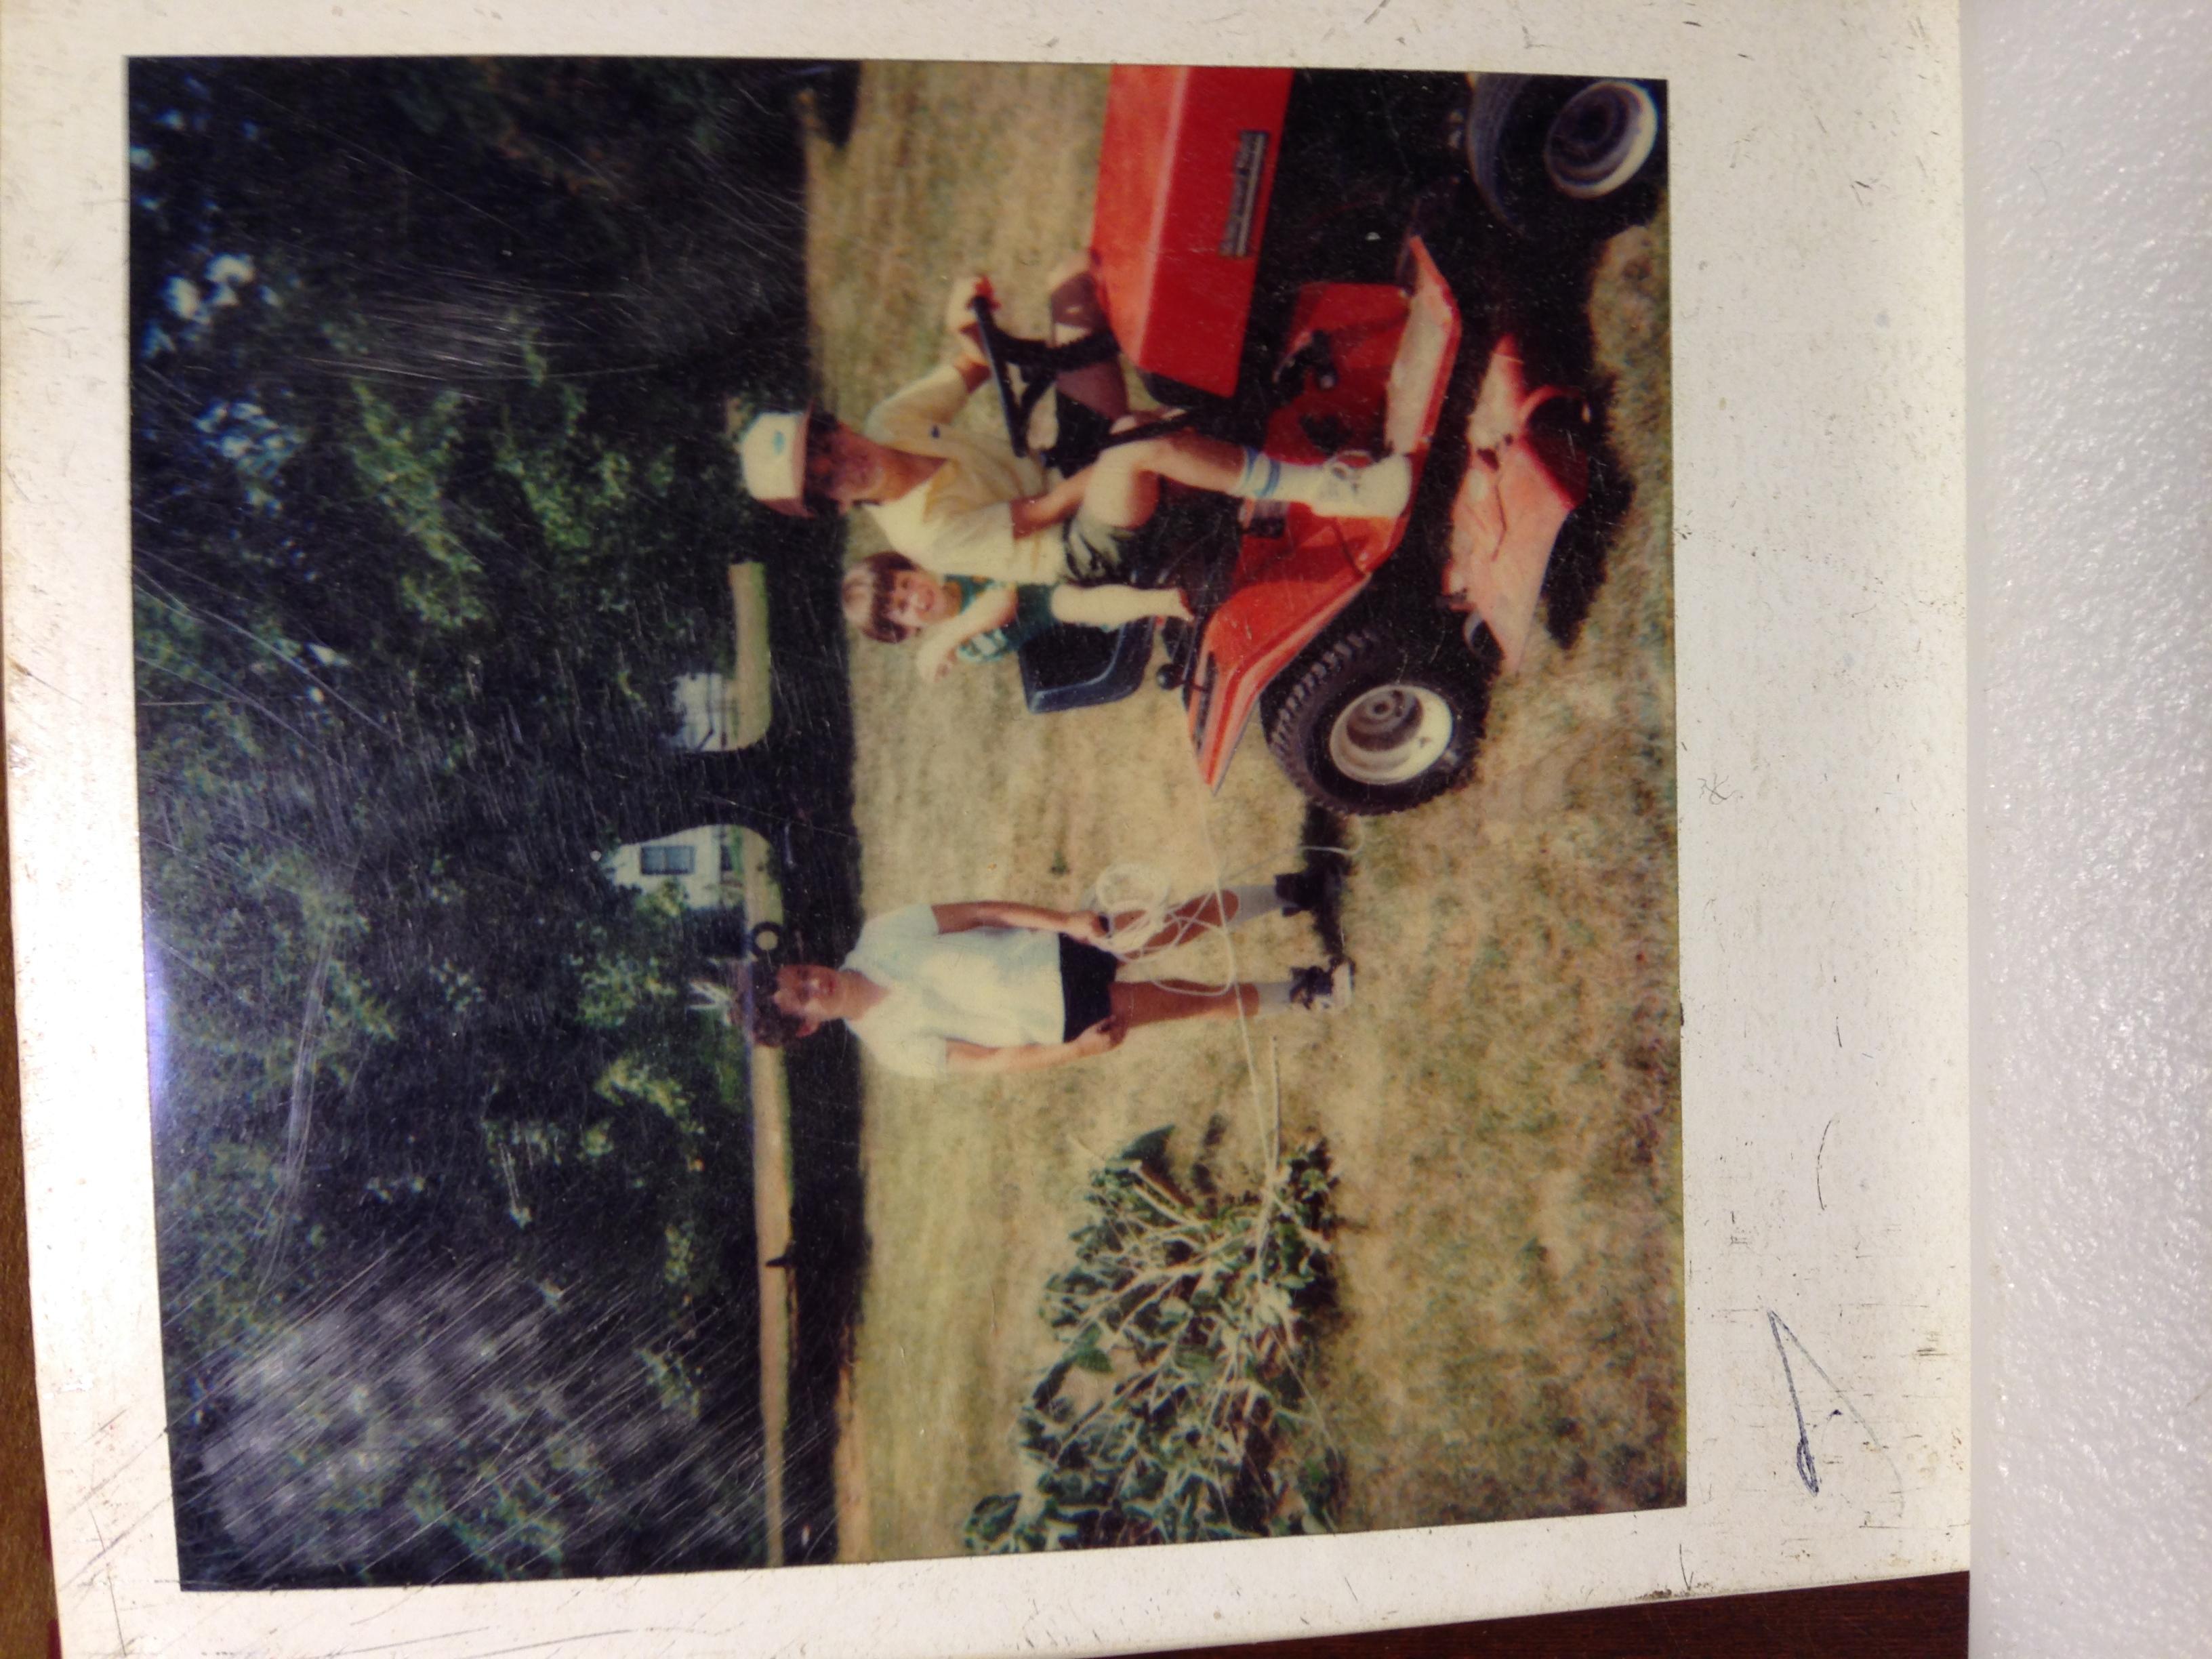 Photo of Dunphy boys as children doing work around farm.